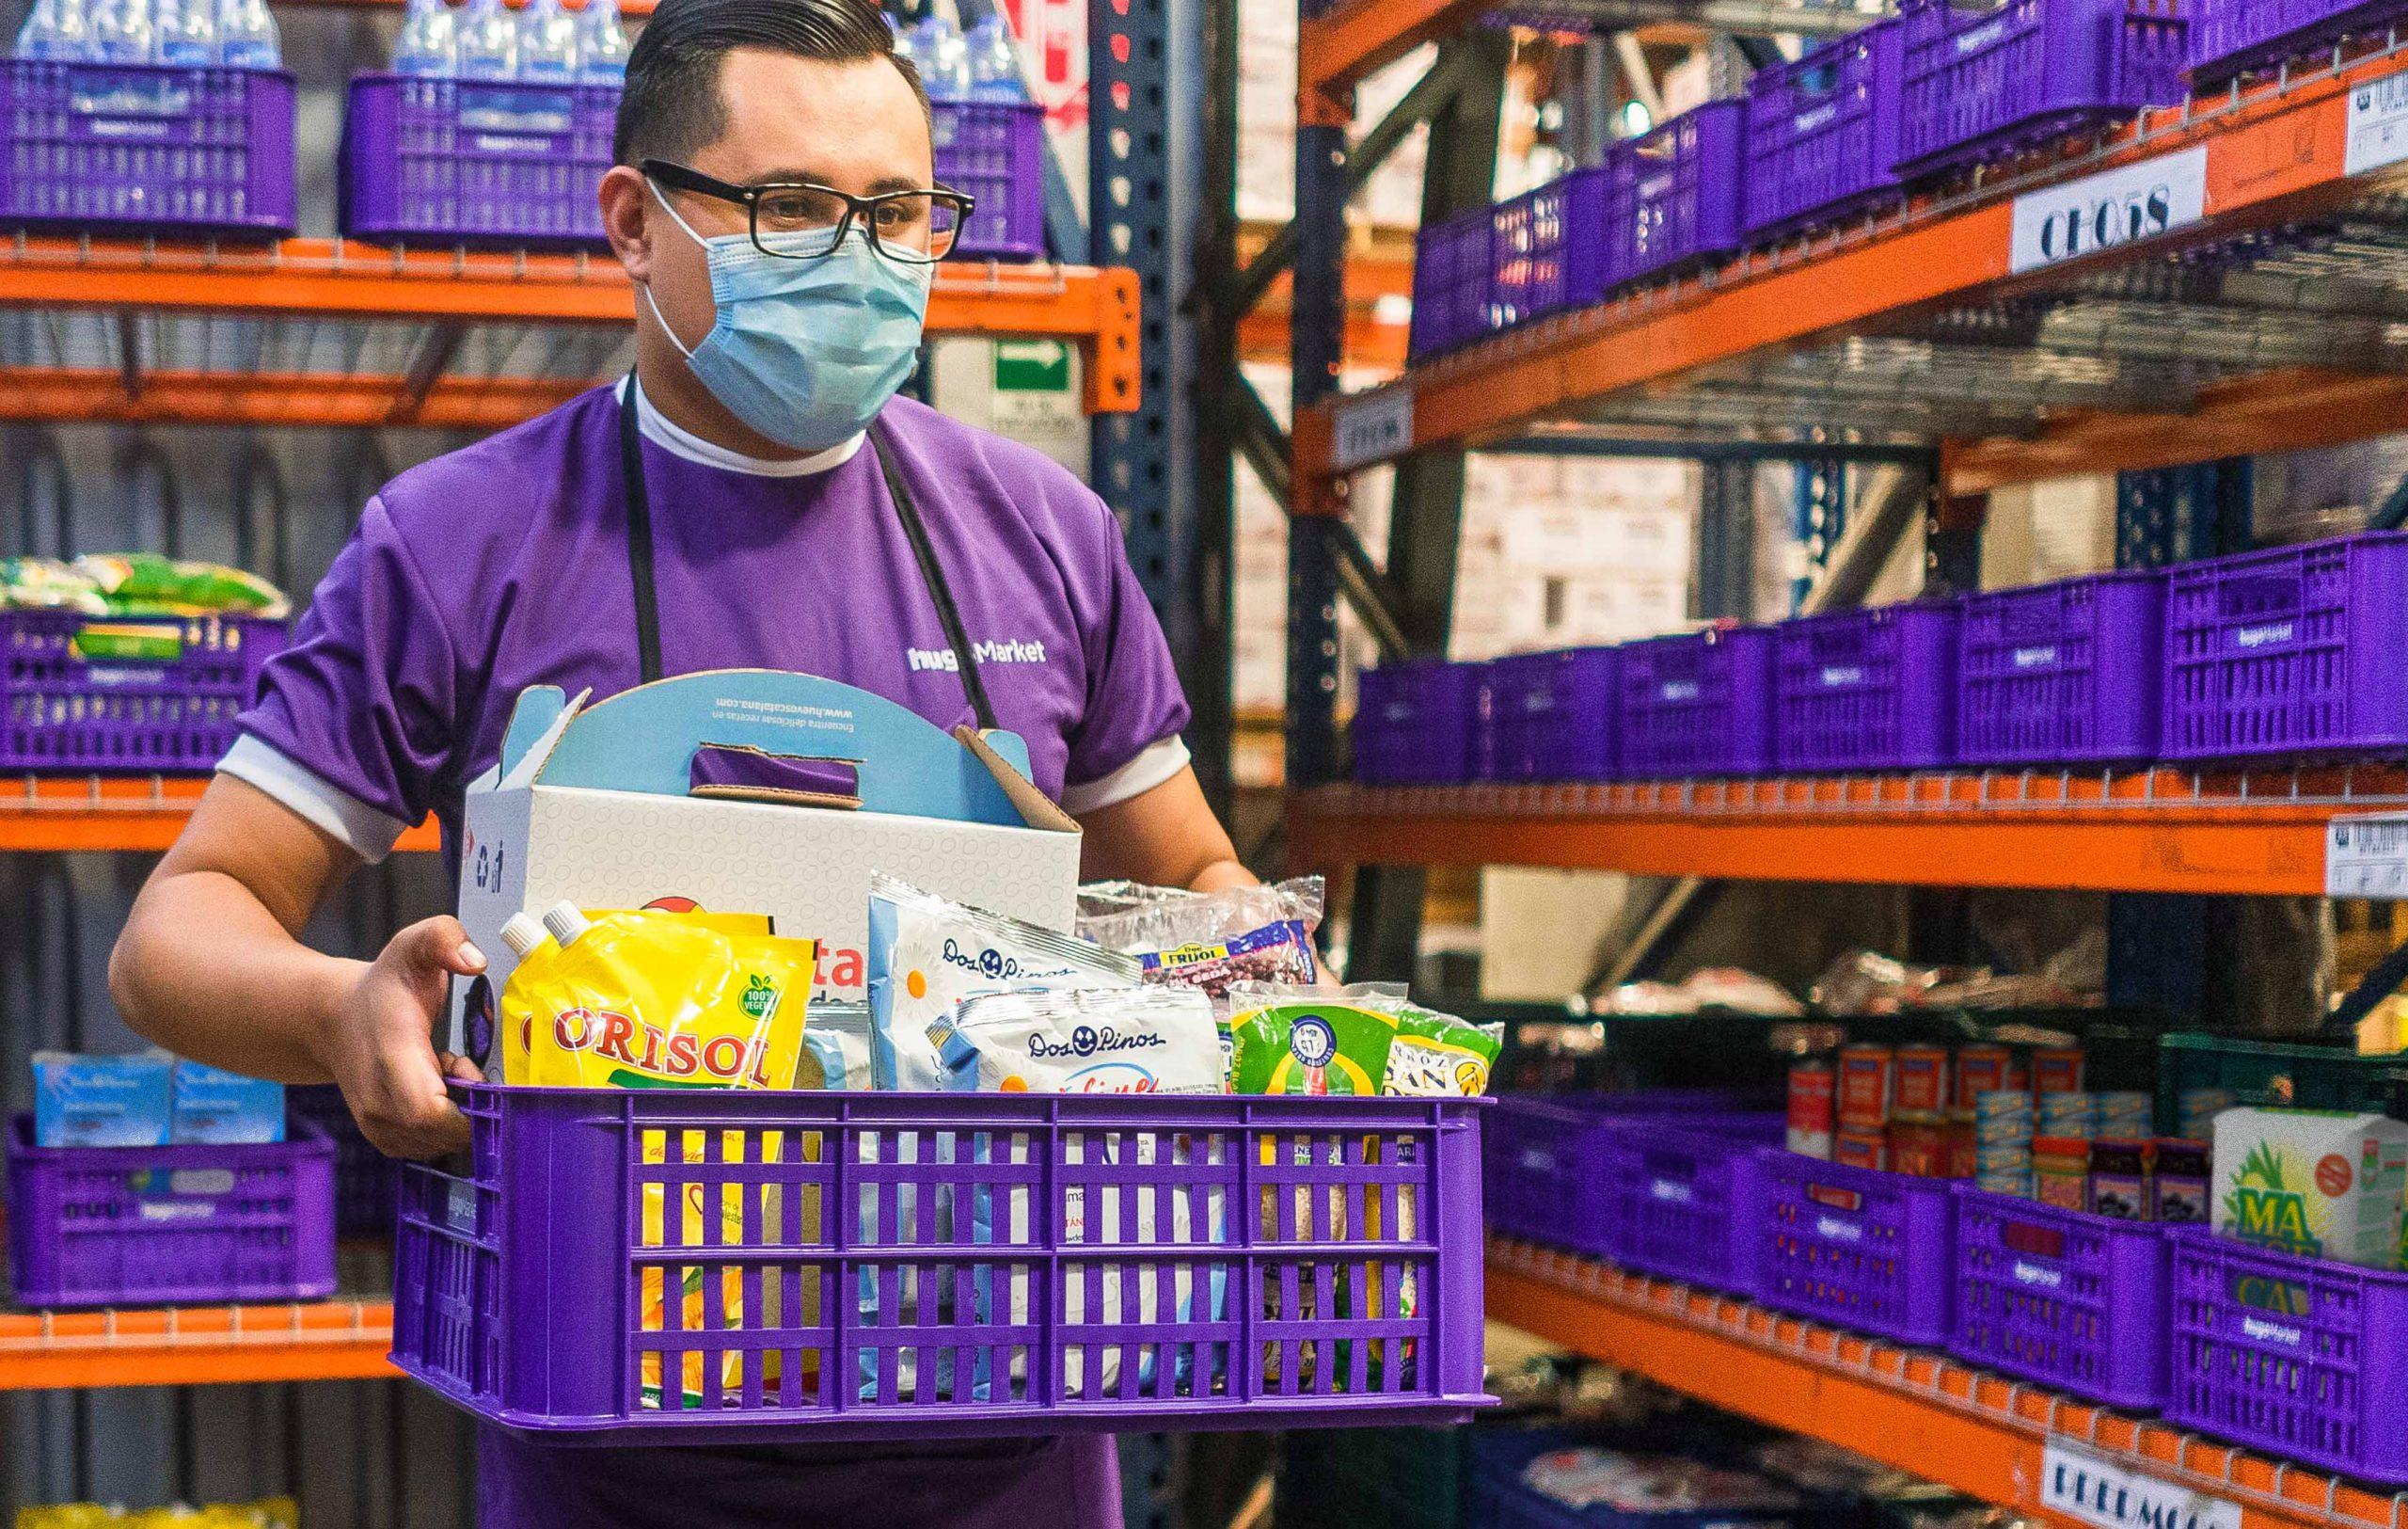 Hugo: Primer supermercado 100% digital en Centroamérica